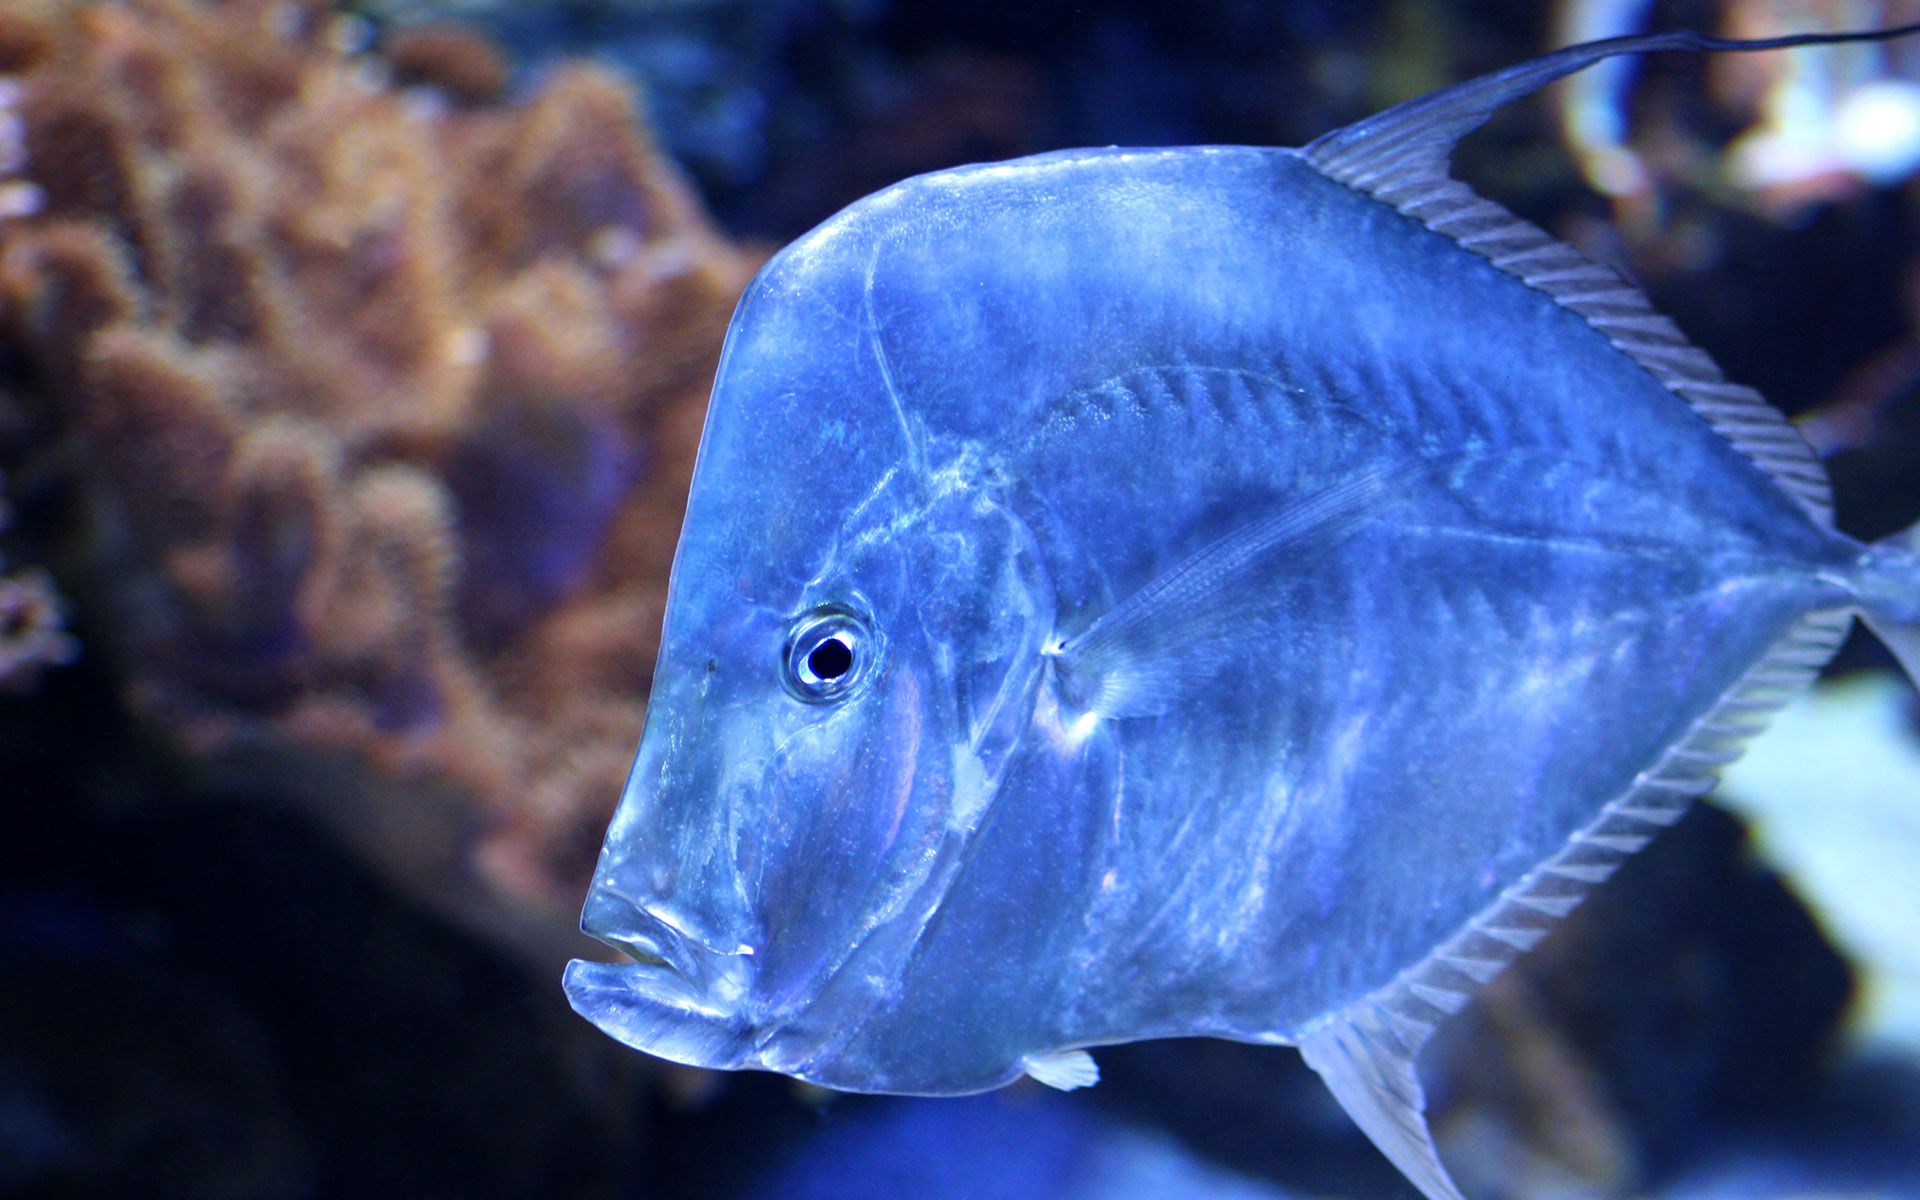 fish marlin desktop 1920x1200 - photo #41